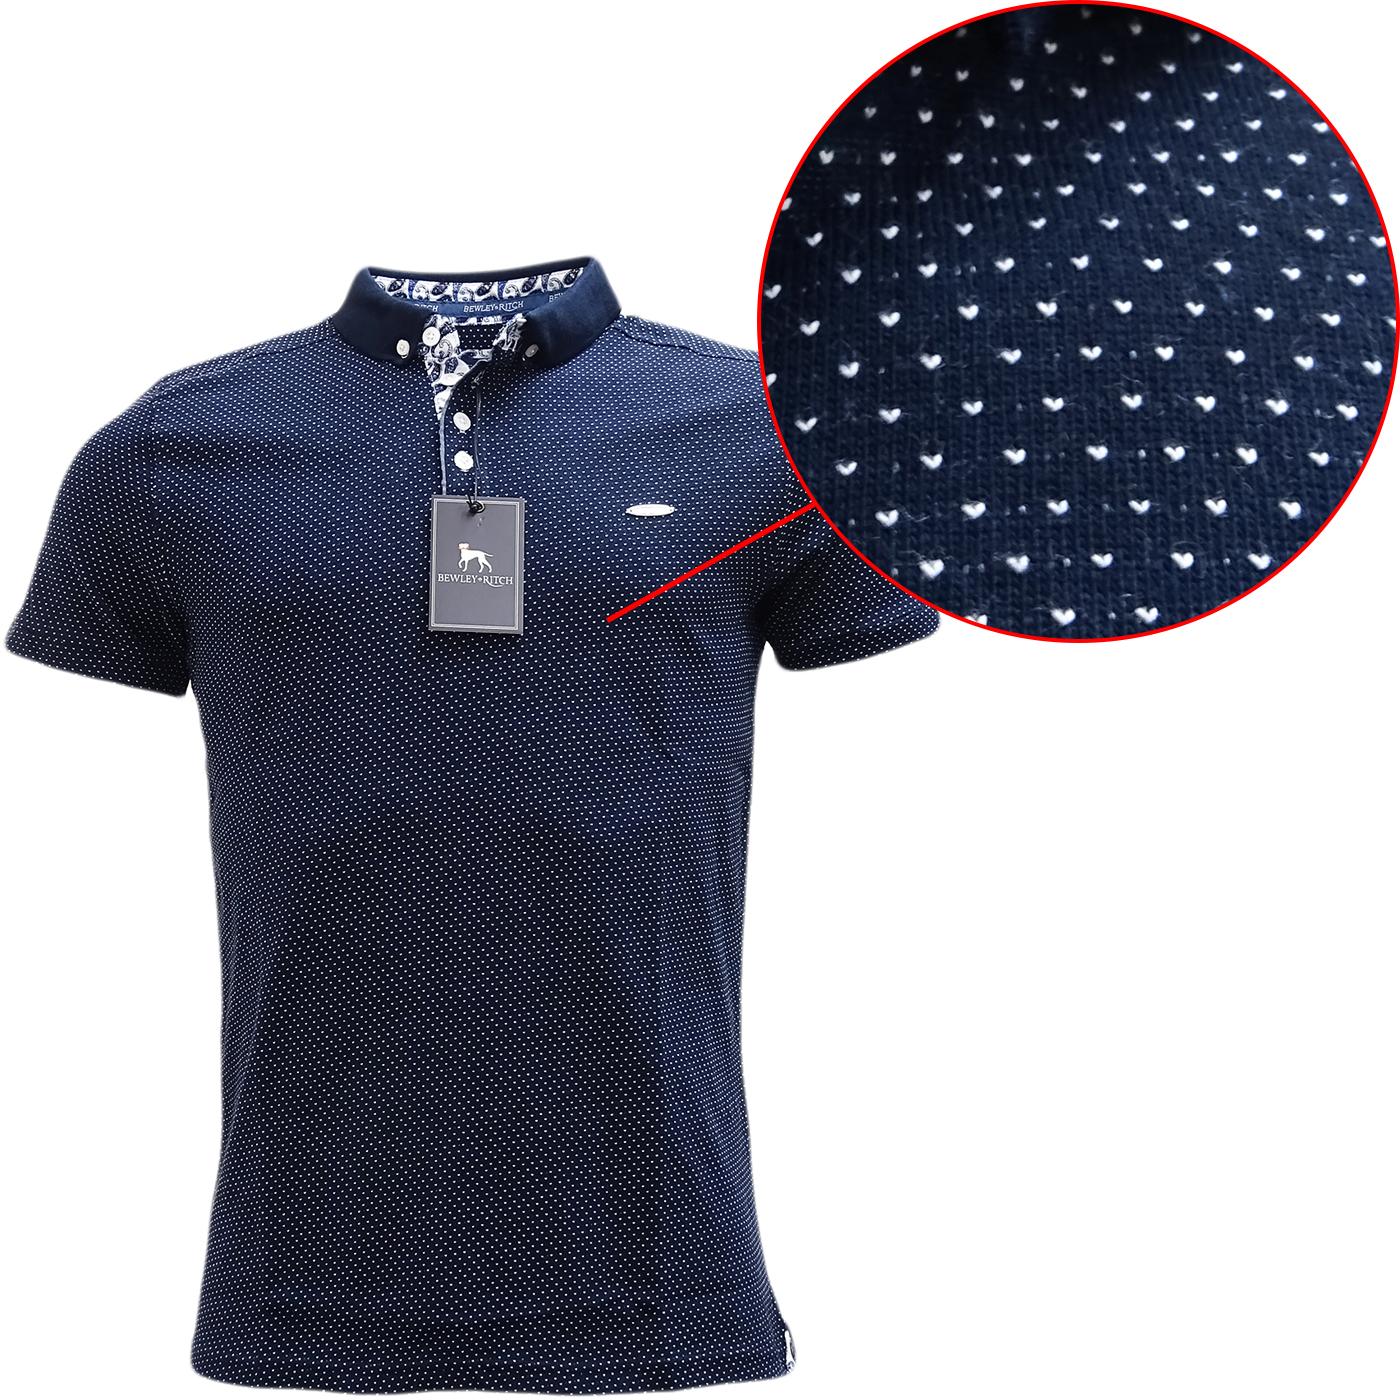 Bewley & Ritch Polka Dot Navy Polo Shirt Geynes